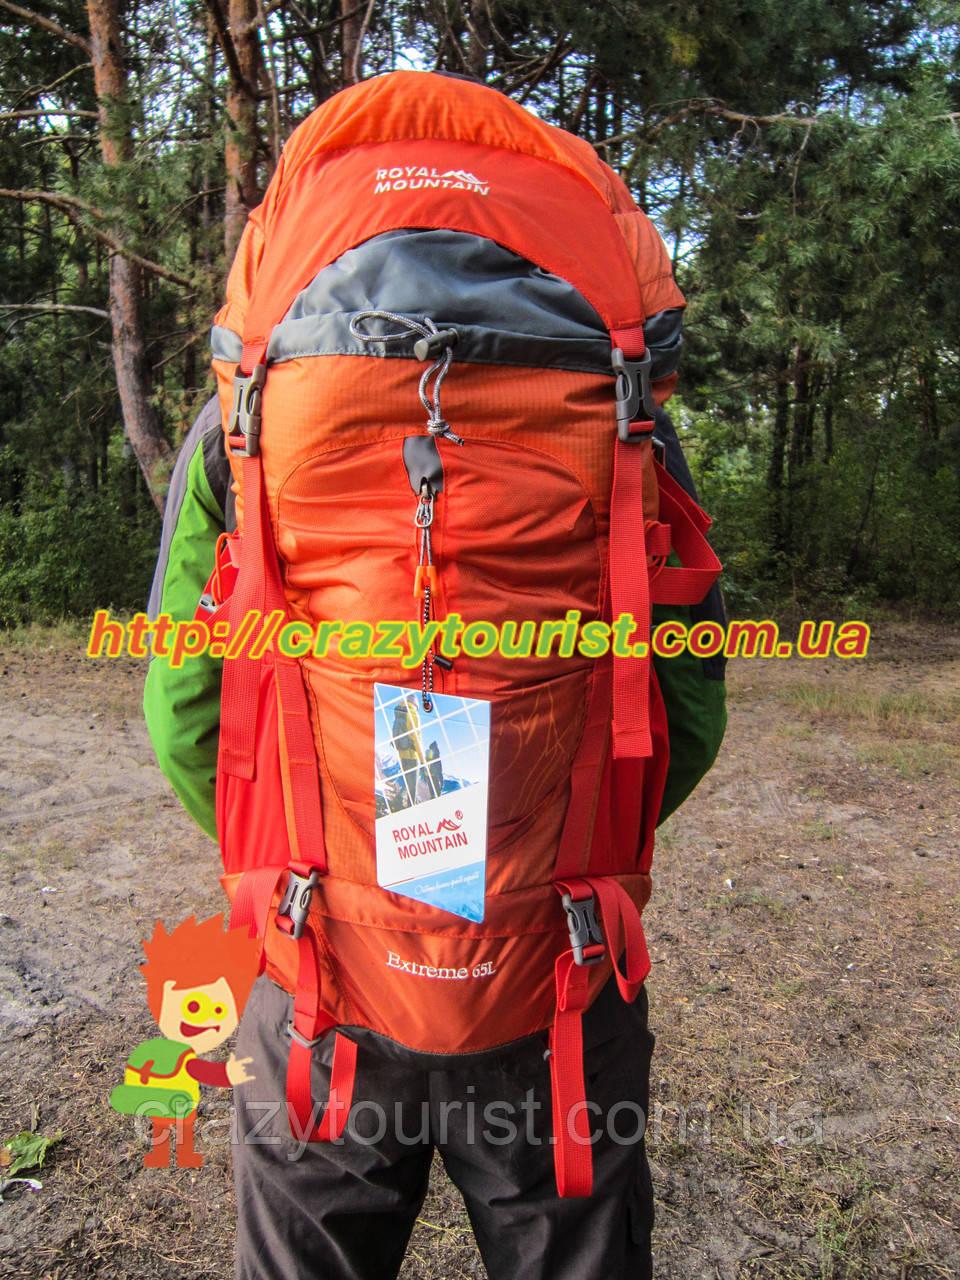 Рюкзак Royal Mountain 8382 65 L Orange - Crazy Tourist в Днепре